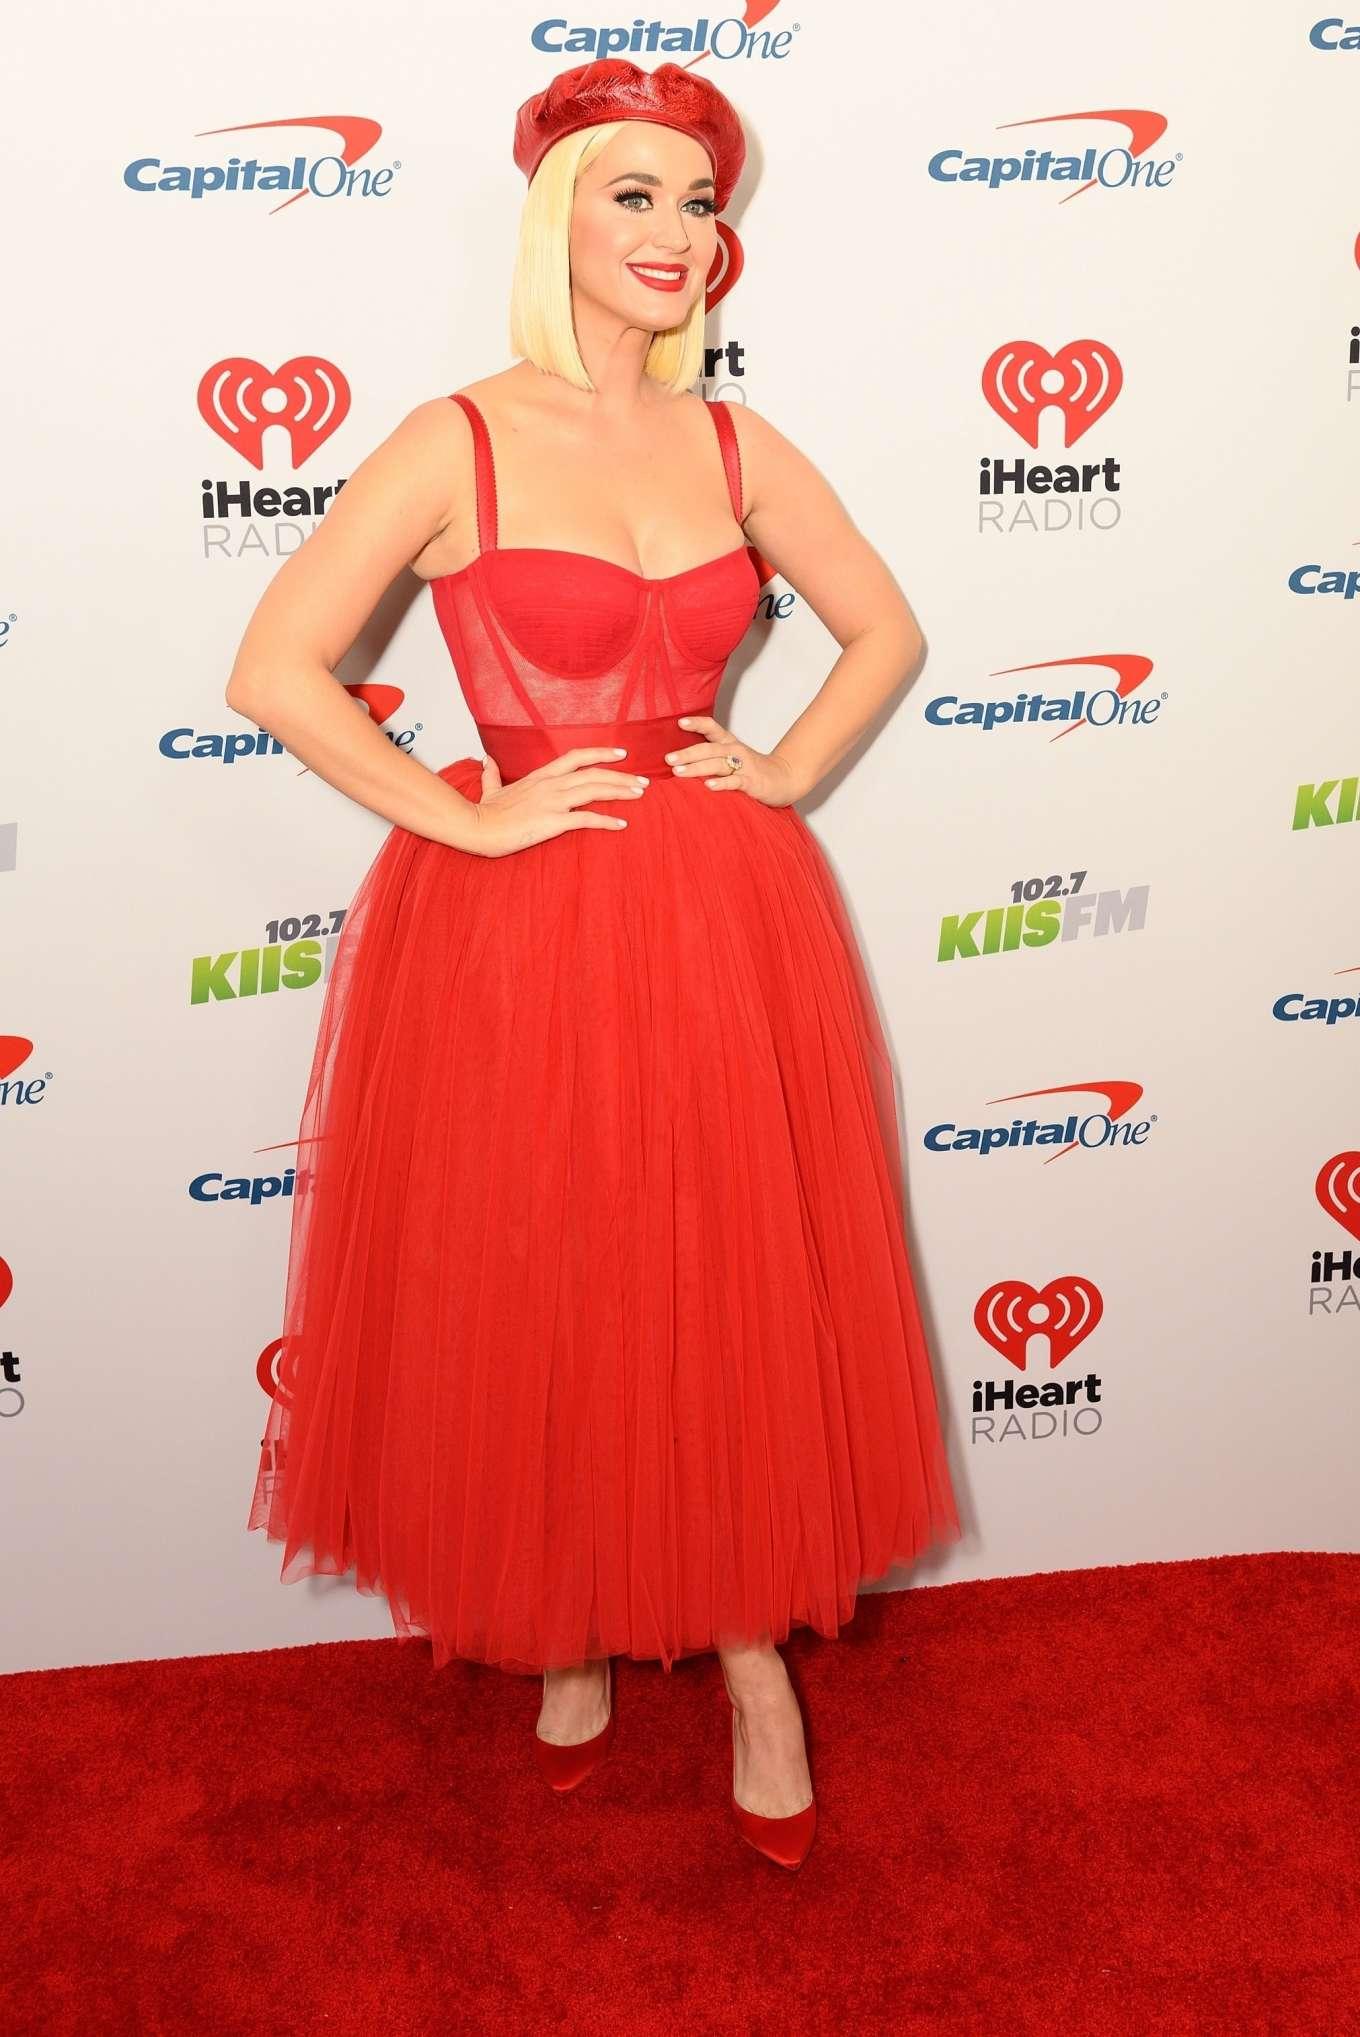 Katy Perry 2019 : Katy Perry – 2019 KIIS FMs iHeartRadio Jingle Ball-11